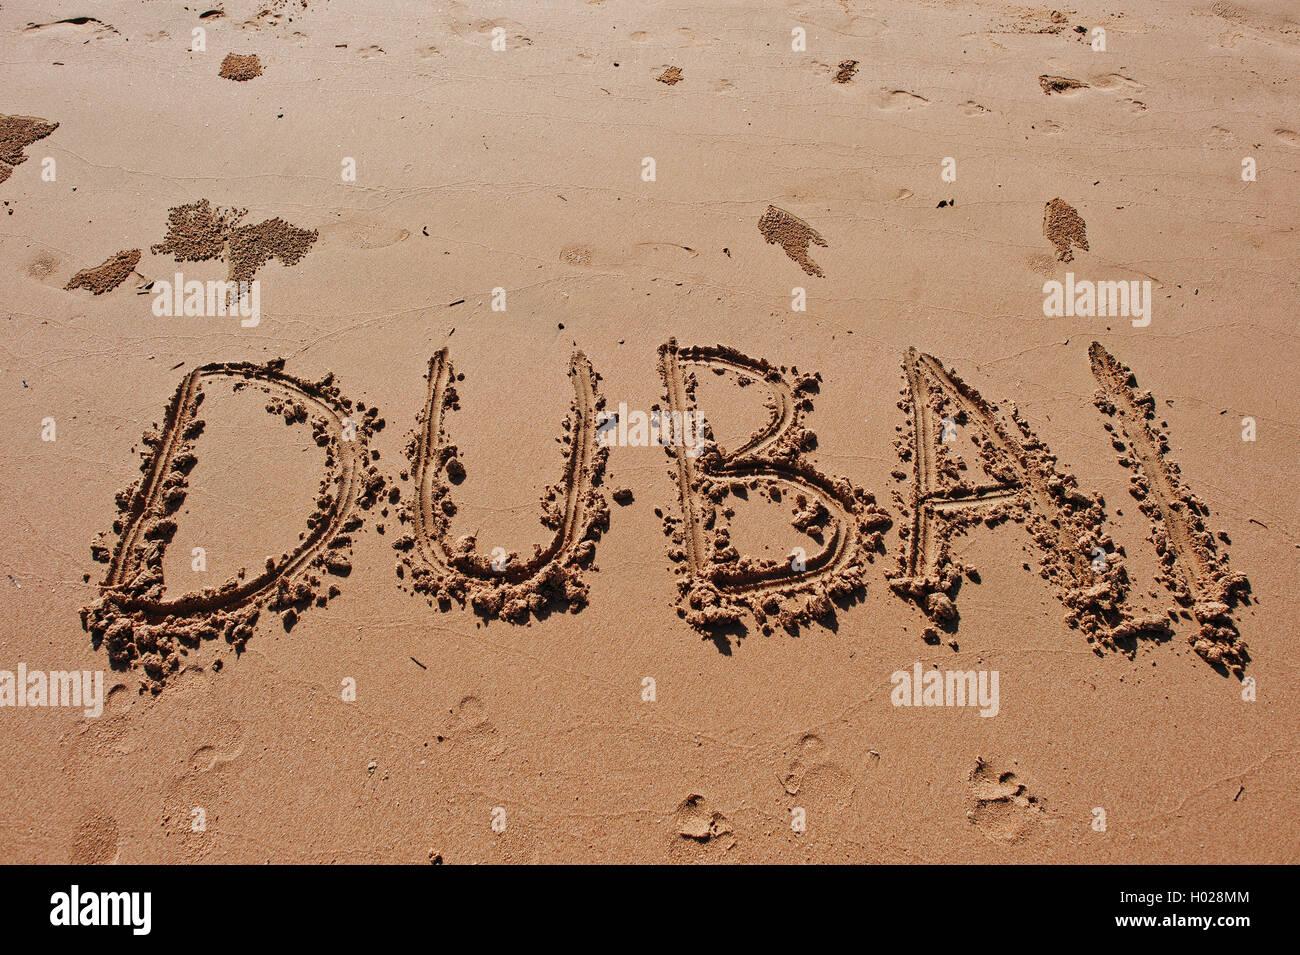 tourism in dubai essay writer